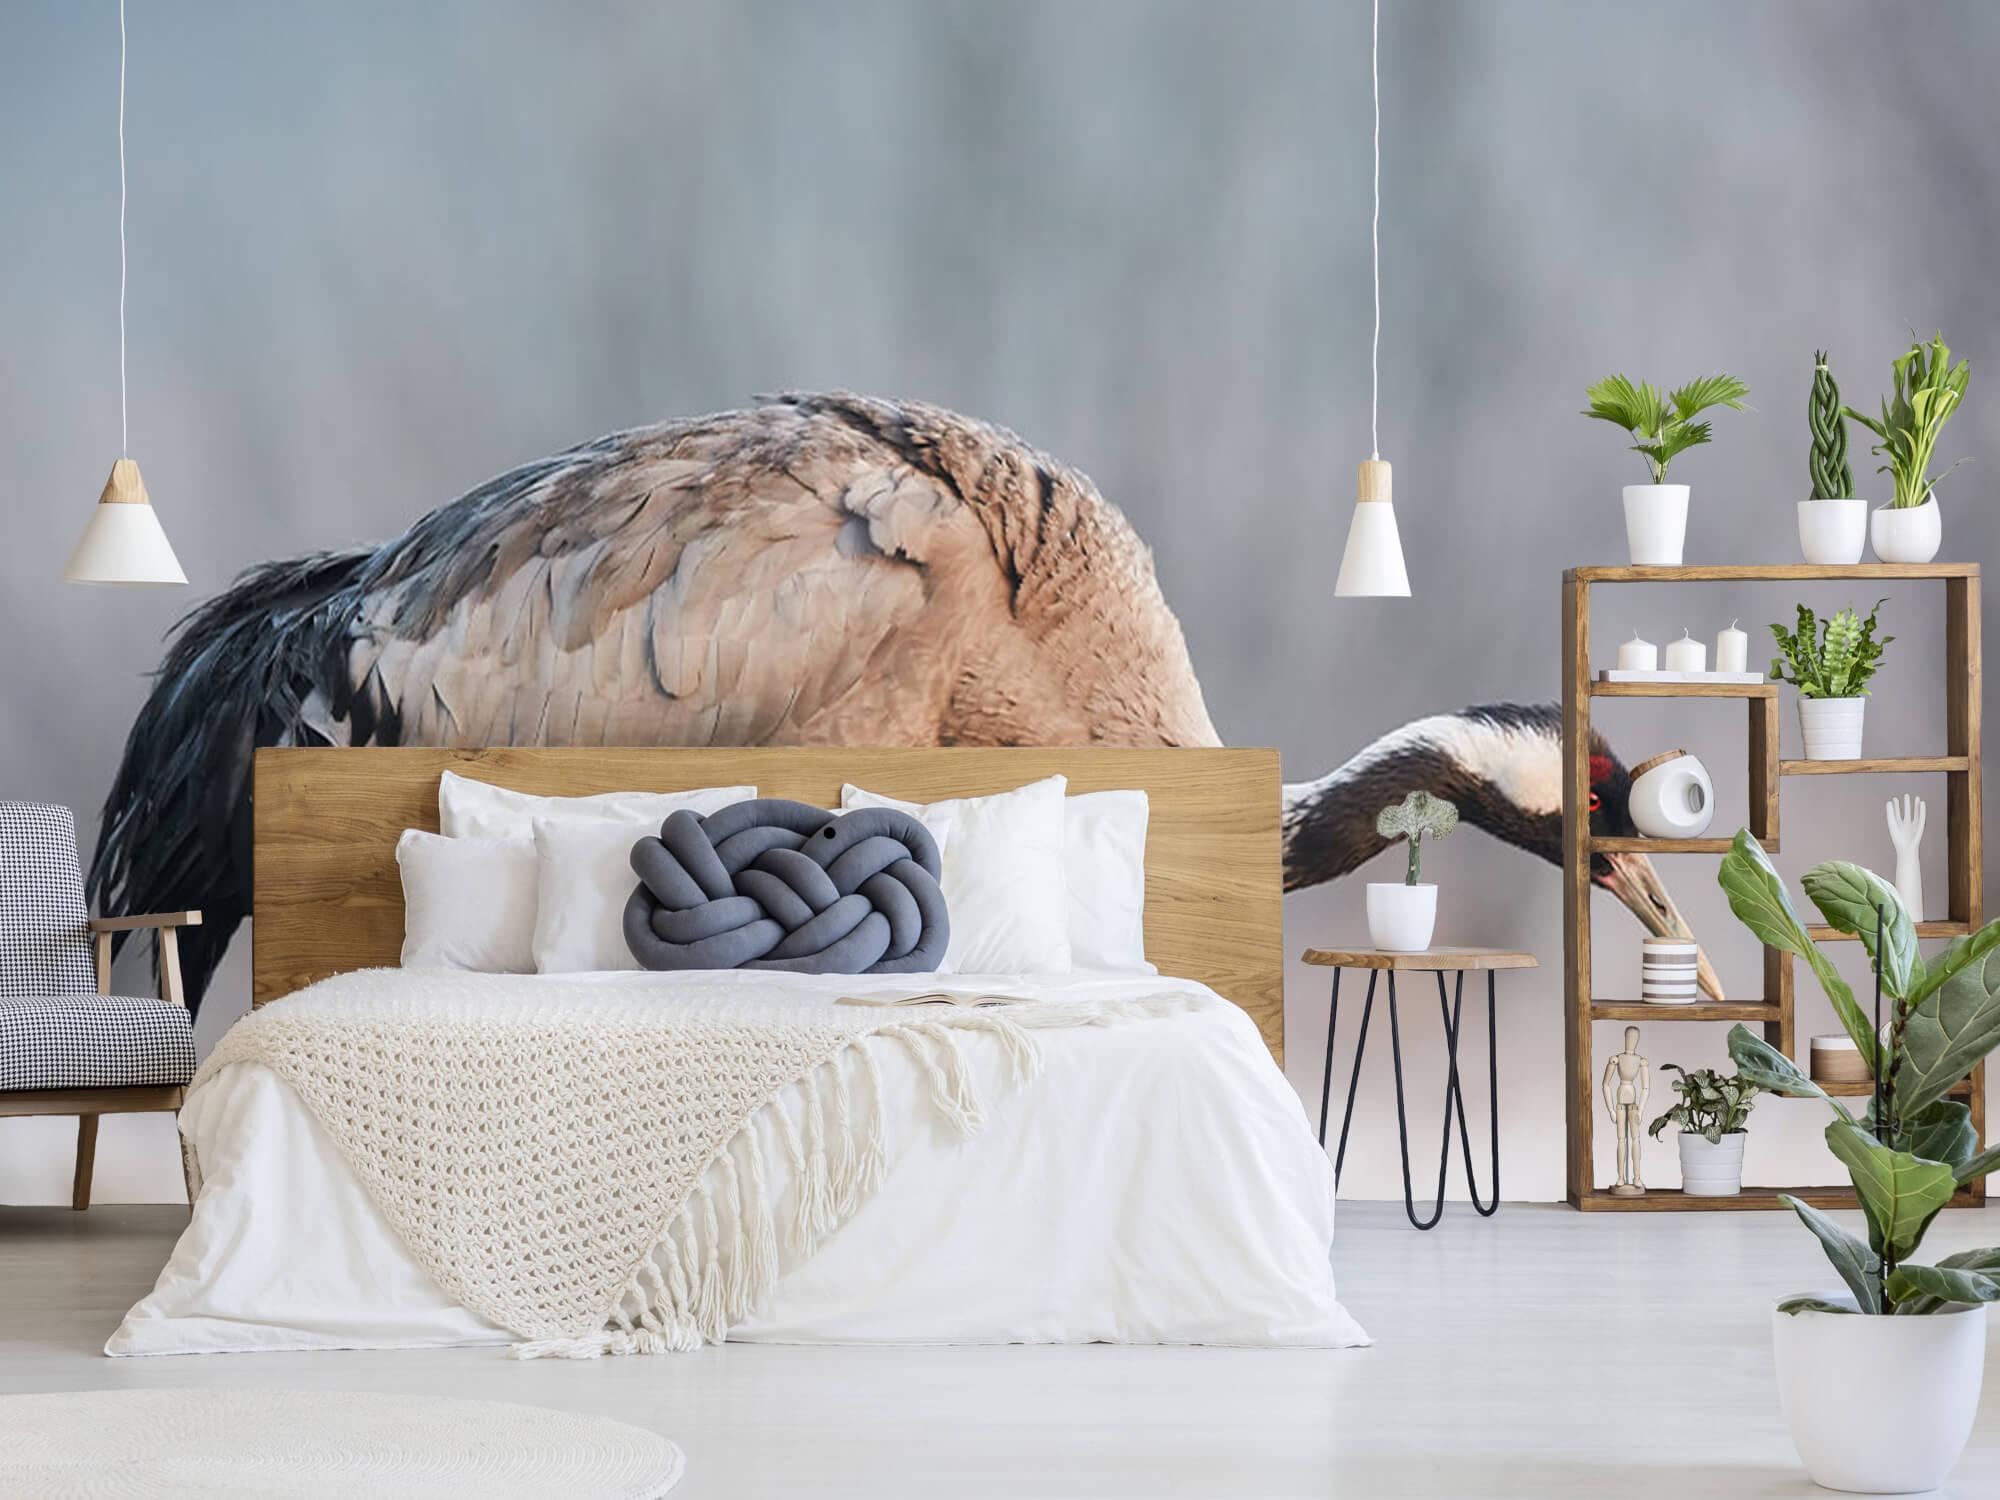 Kraanvogel in de ochtend 7